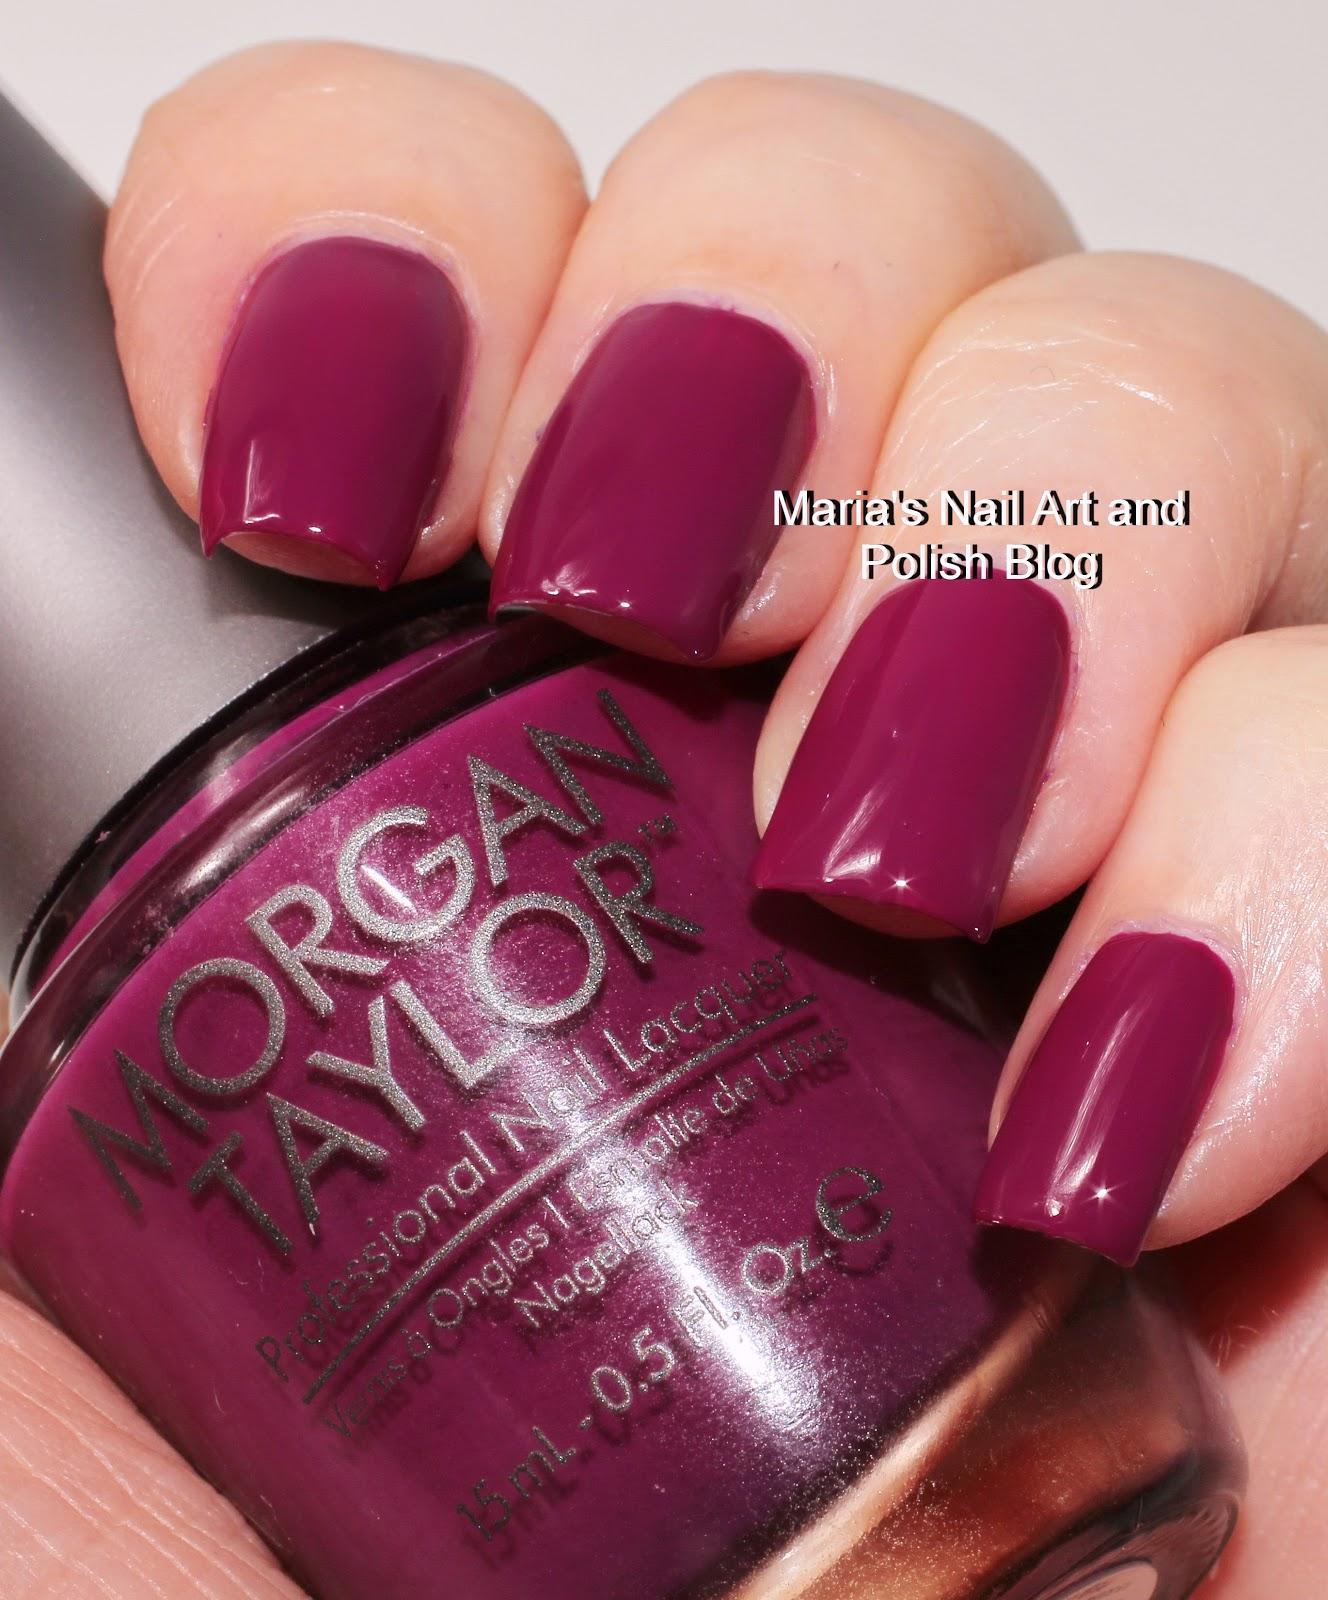 Marias nail art and polish blog morgan taylor berry perfection morgan taylor berry perfection and mint chocolate chip swatches prinsesfo Images